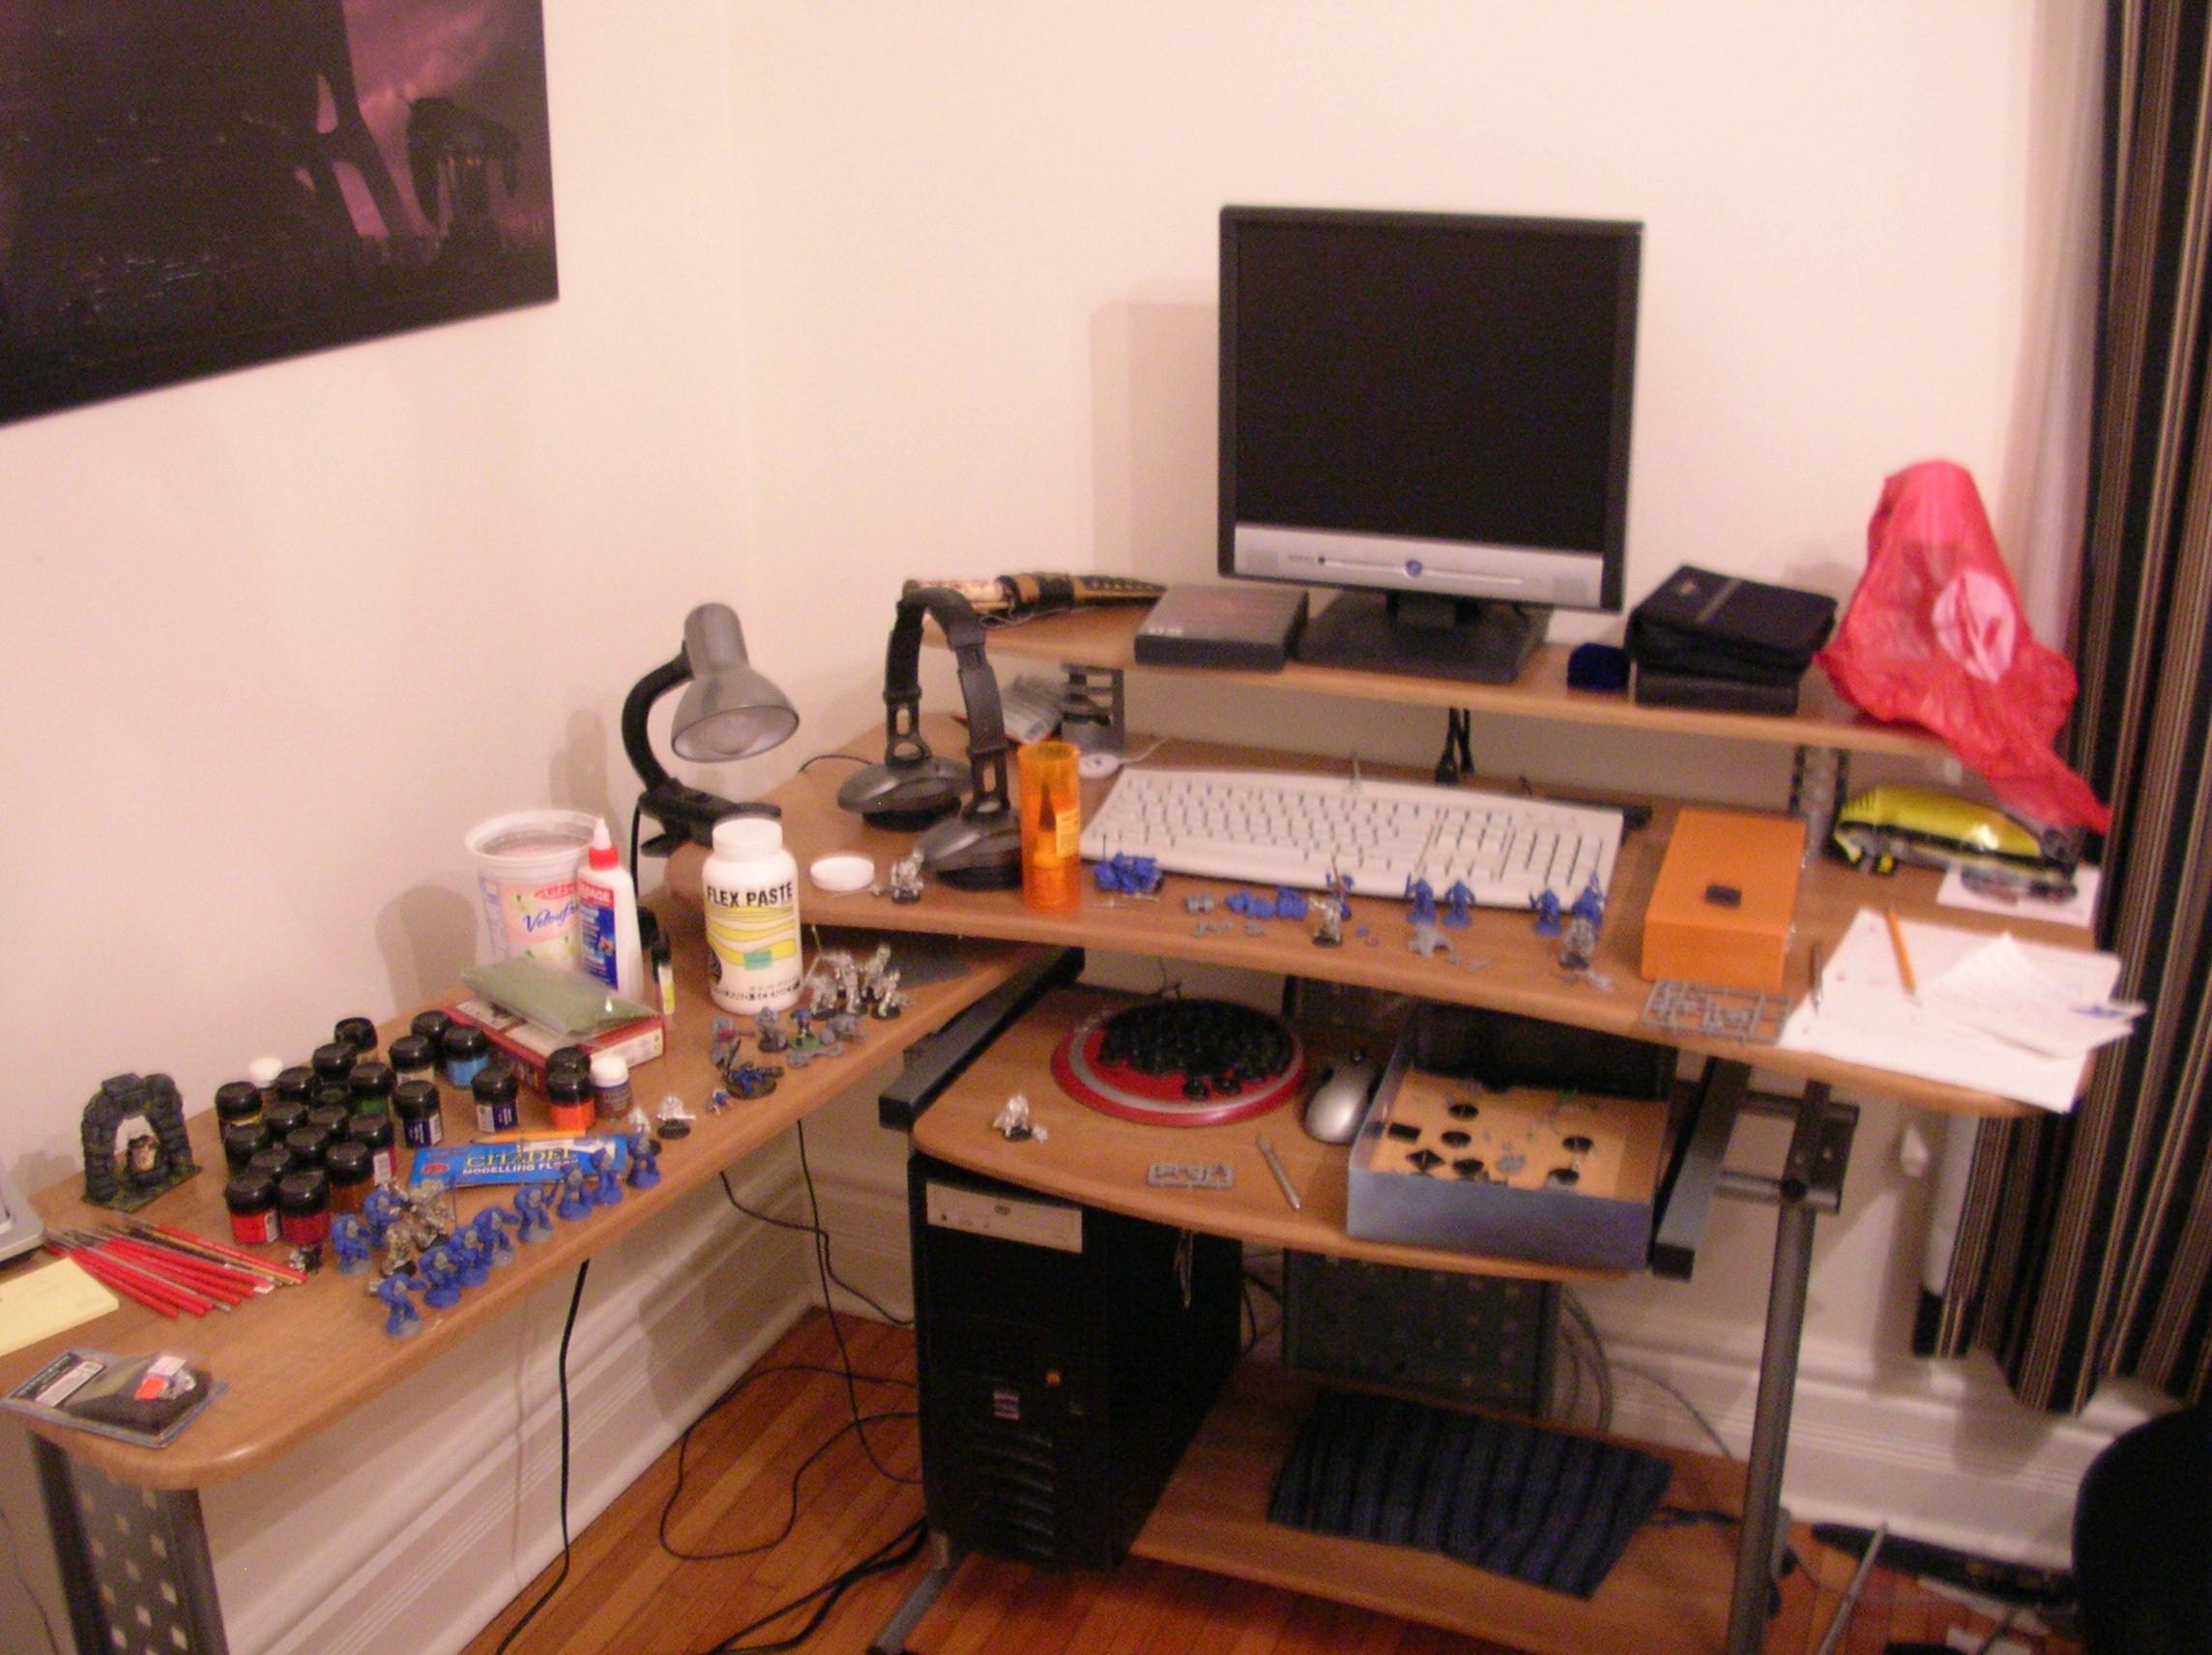 Hobby Area, My dakka dakka and minatures work space